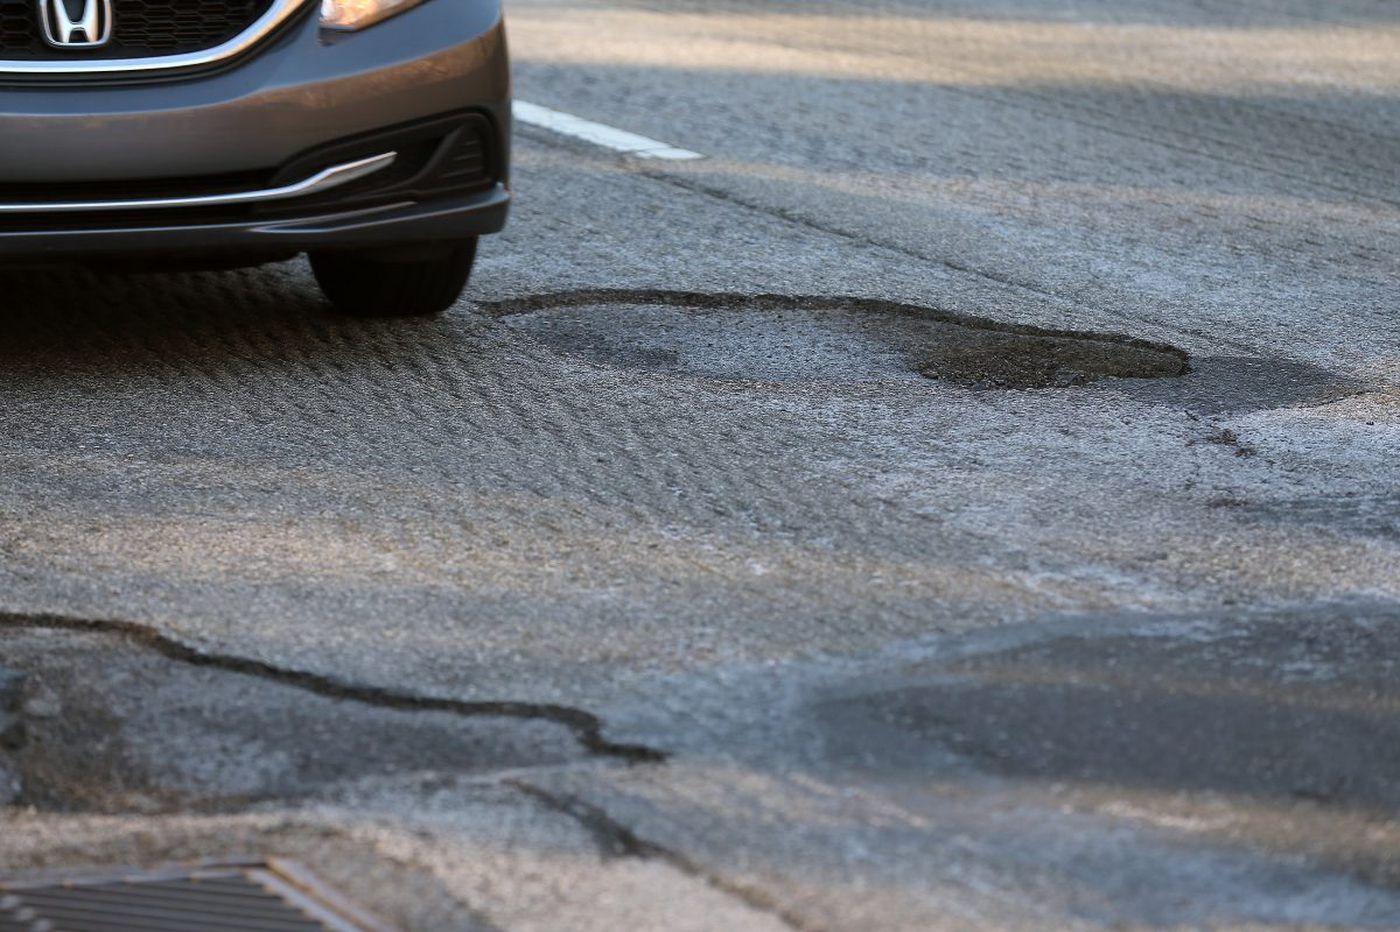 Motorists beware: Potholes are flattening tires around the region